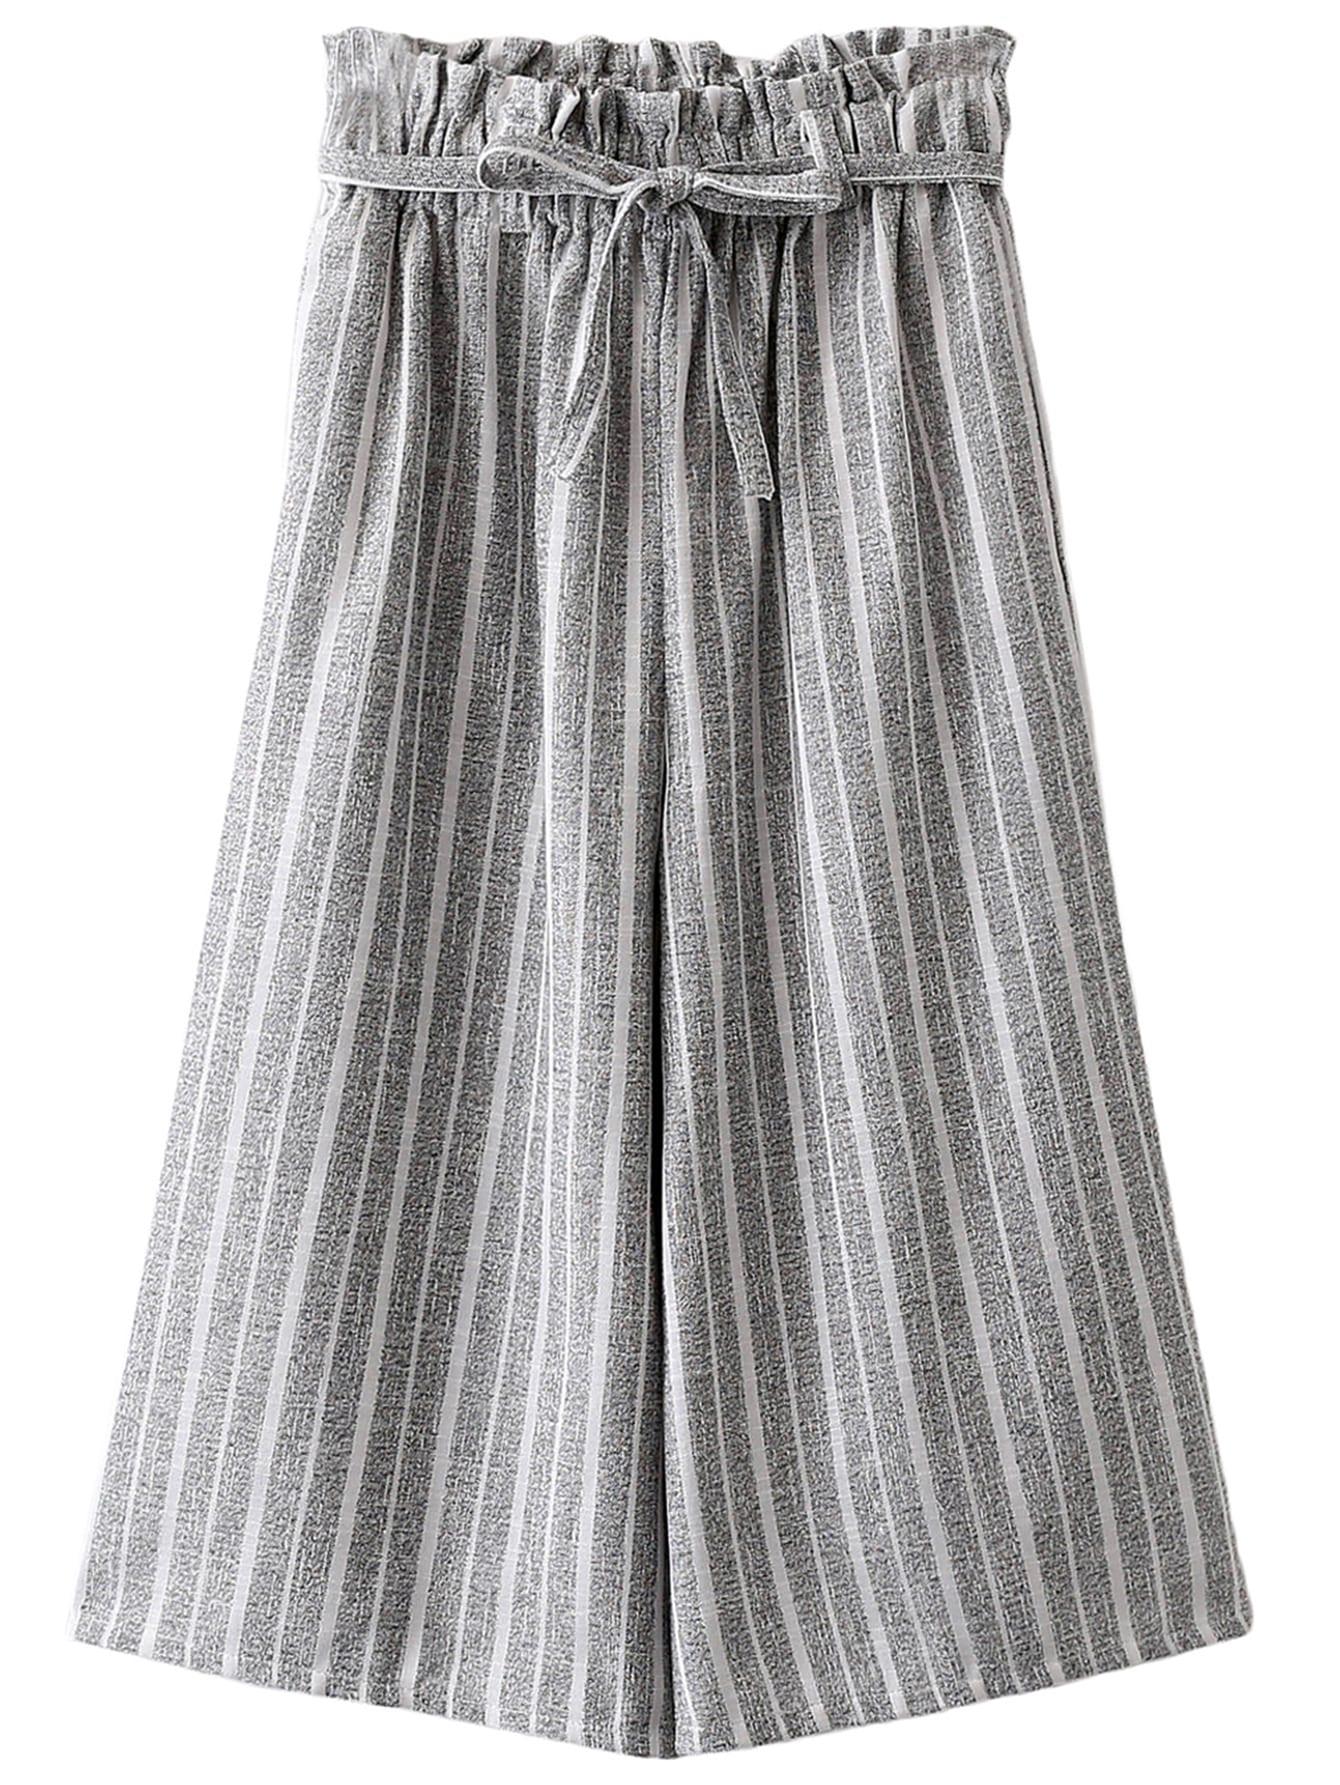 28ceb27feda61 Grey Pockets Tie-waist Bow Vertical Stripe Wide Leg Pants -SheIn(Sheinside)